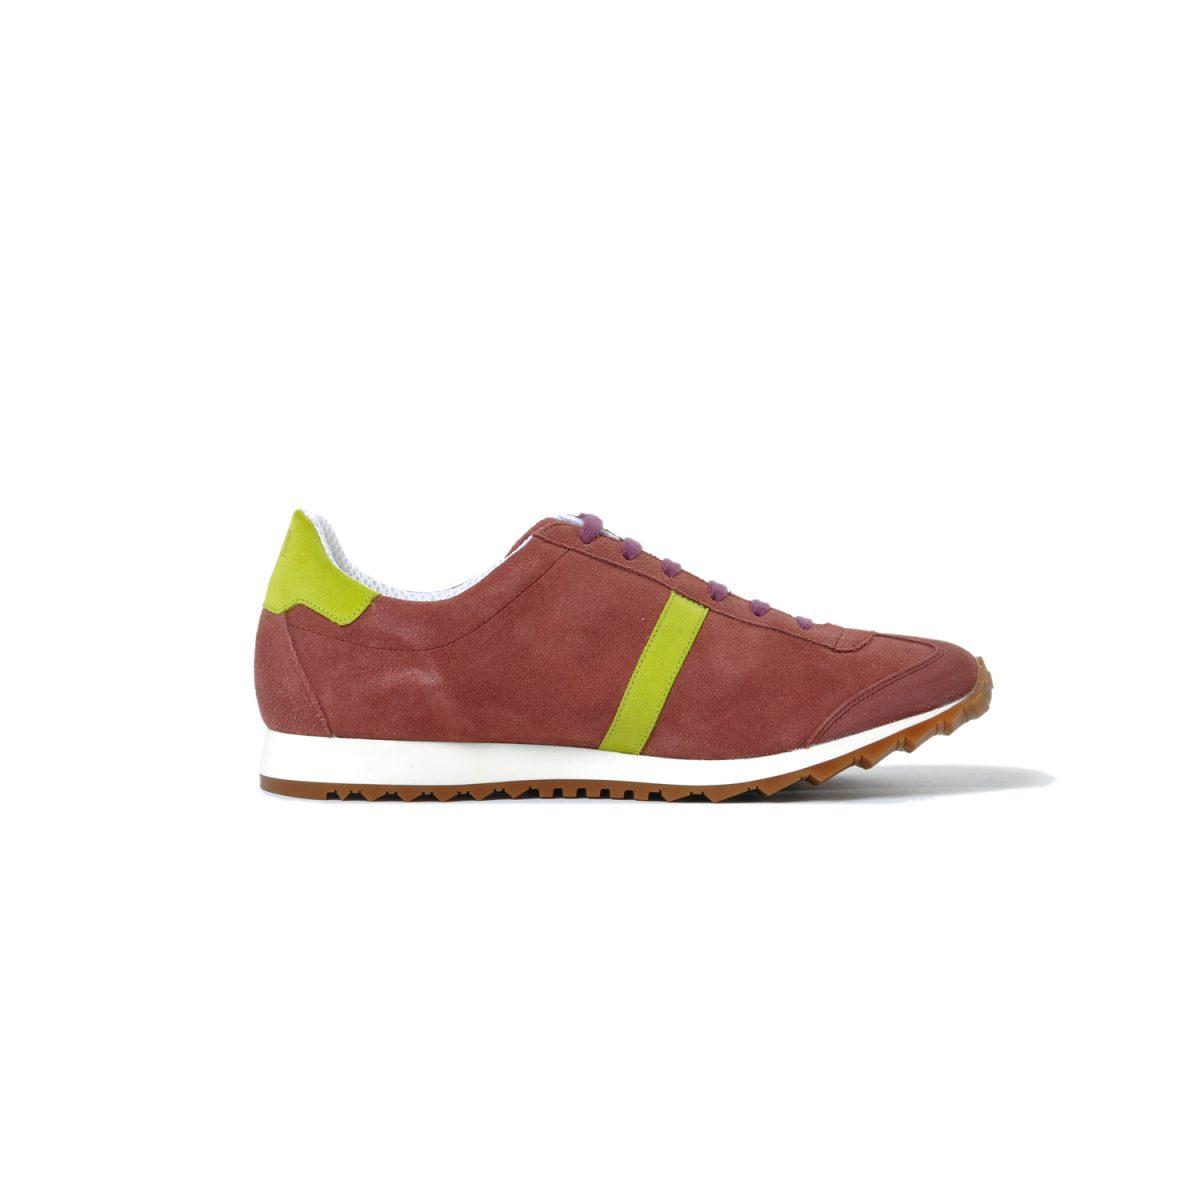 Tisza shoes - Martfű - Maroon-lime